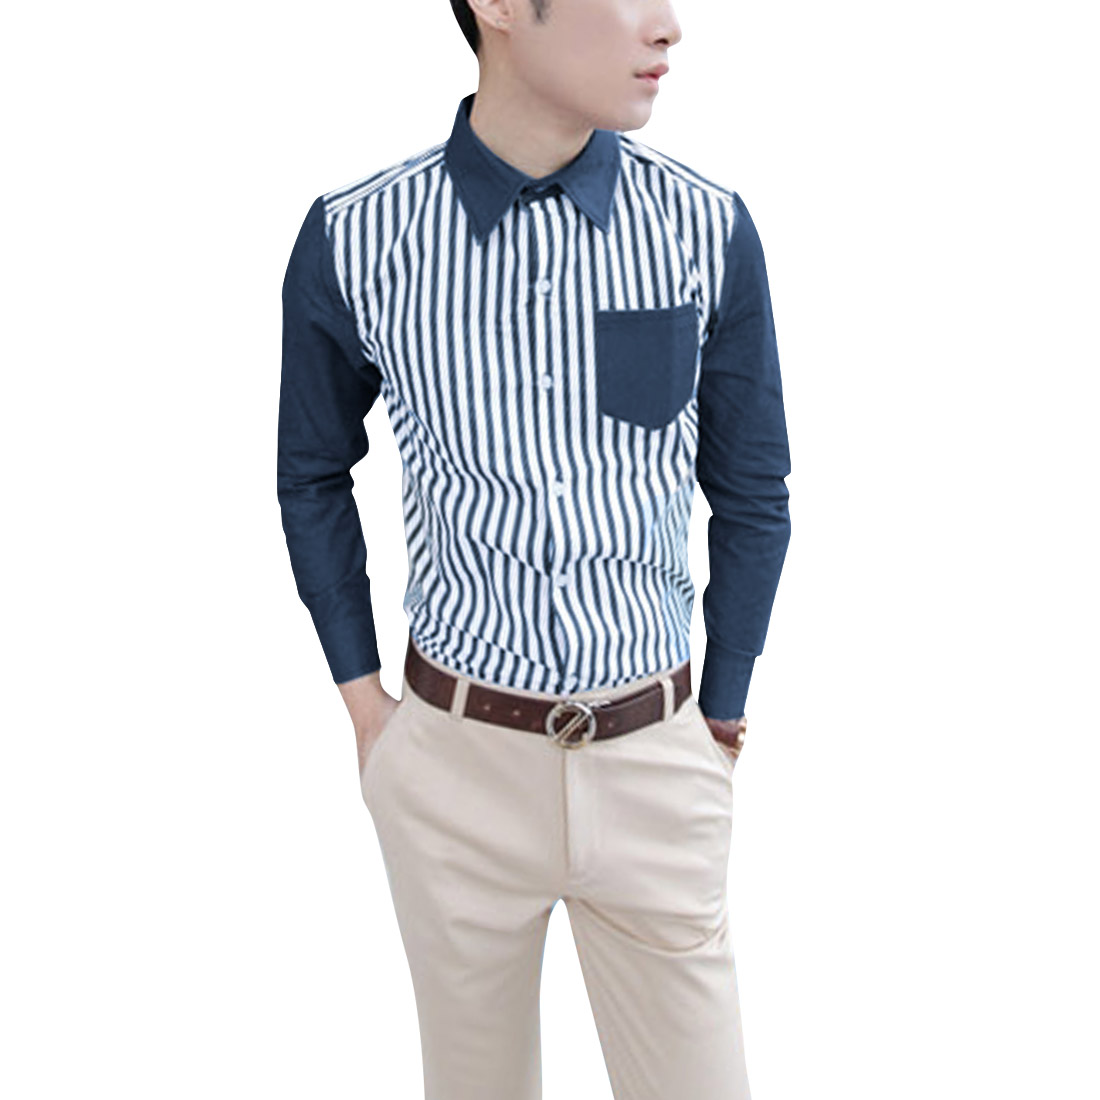 Men Denim Splicing Navy Blue White Stripes Long Sleeve Casual Shirt M